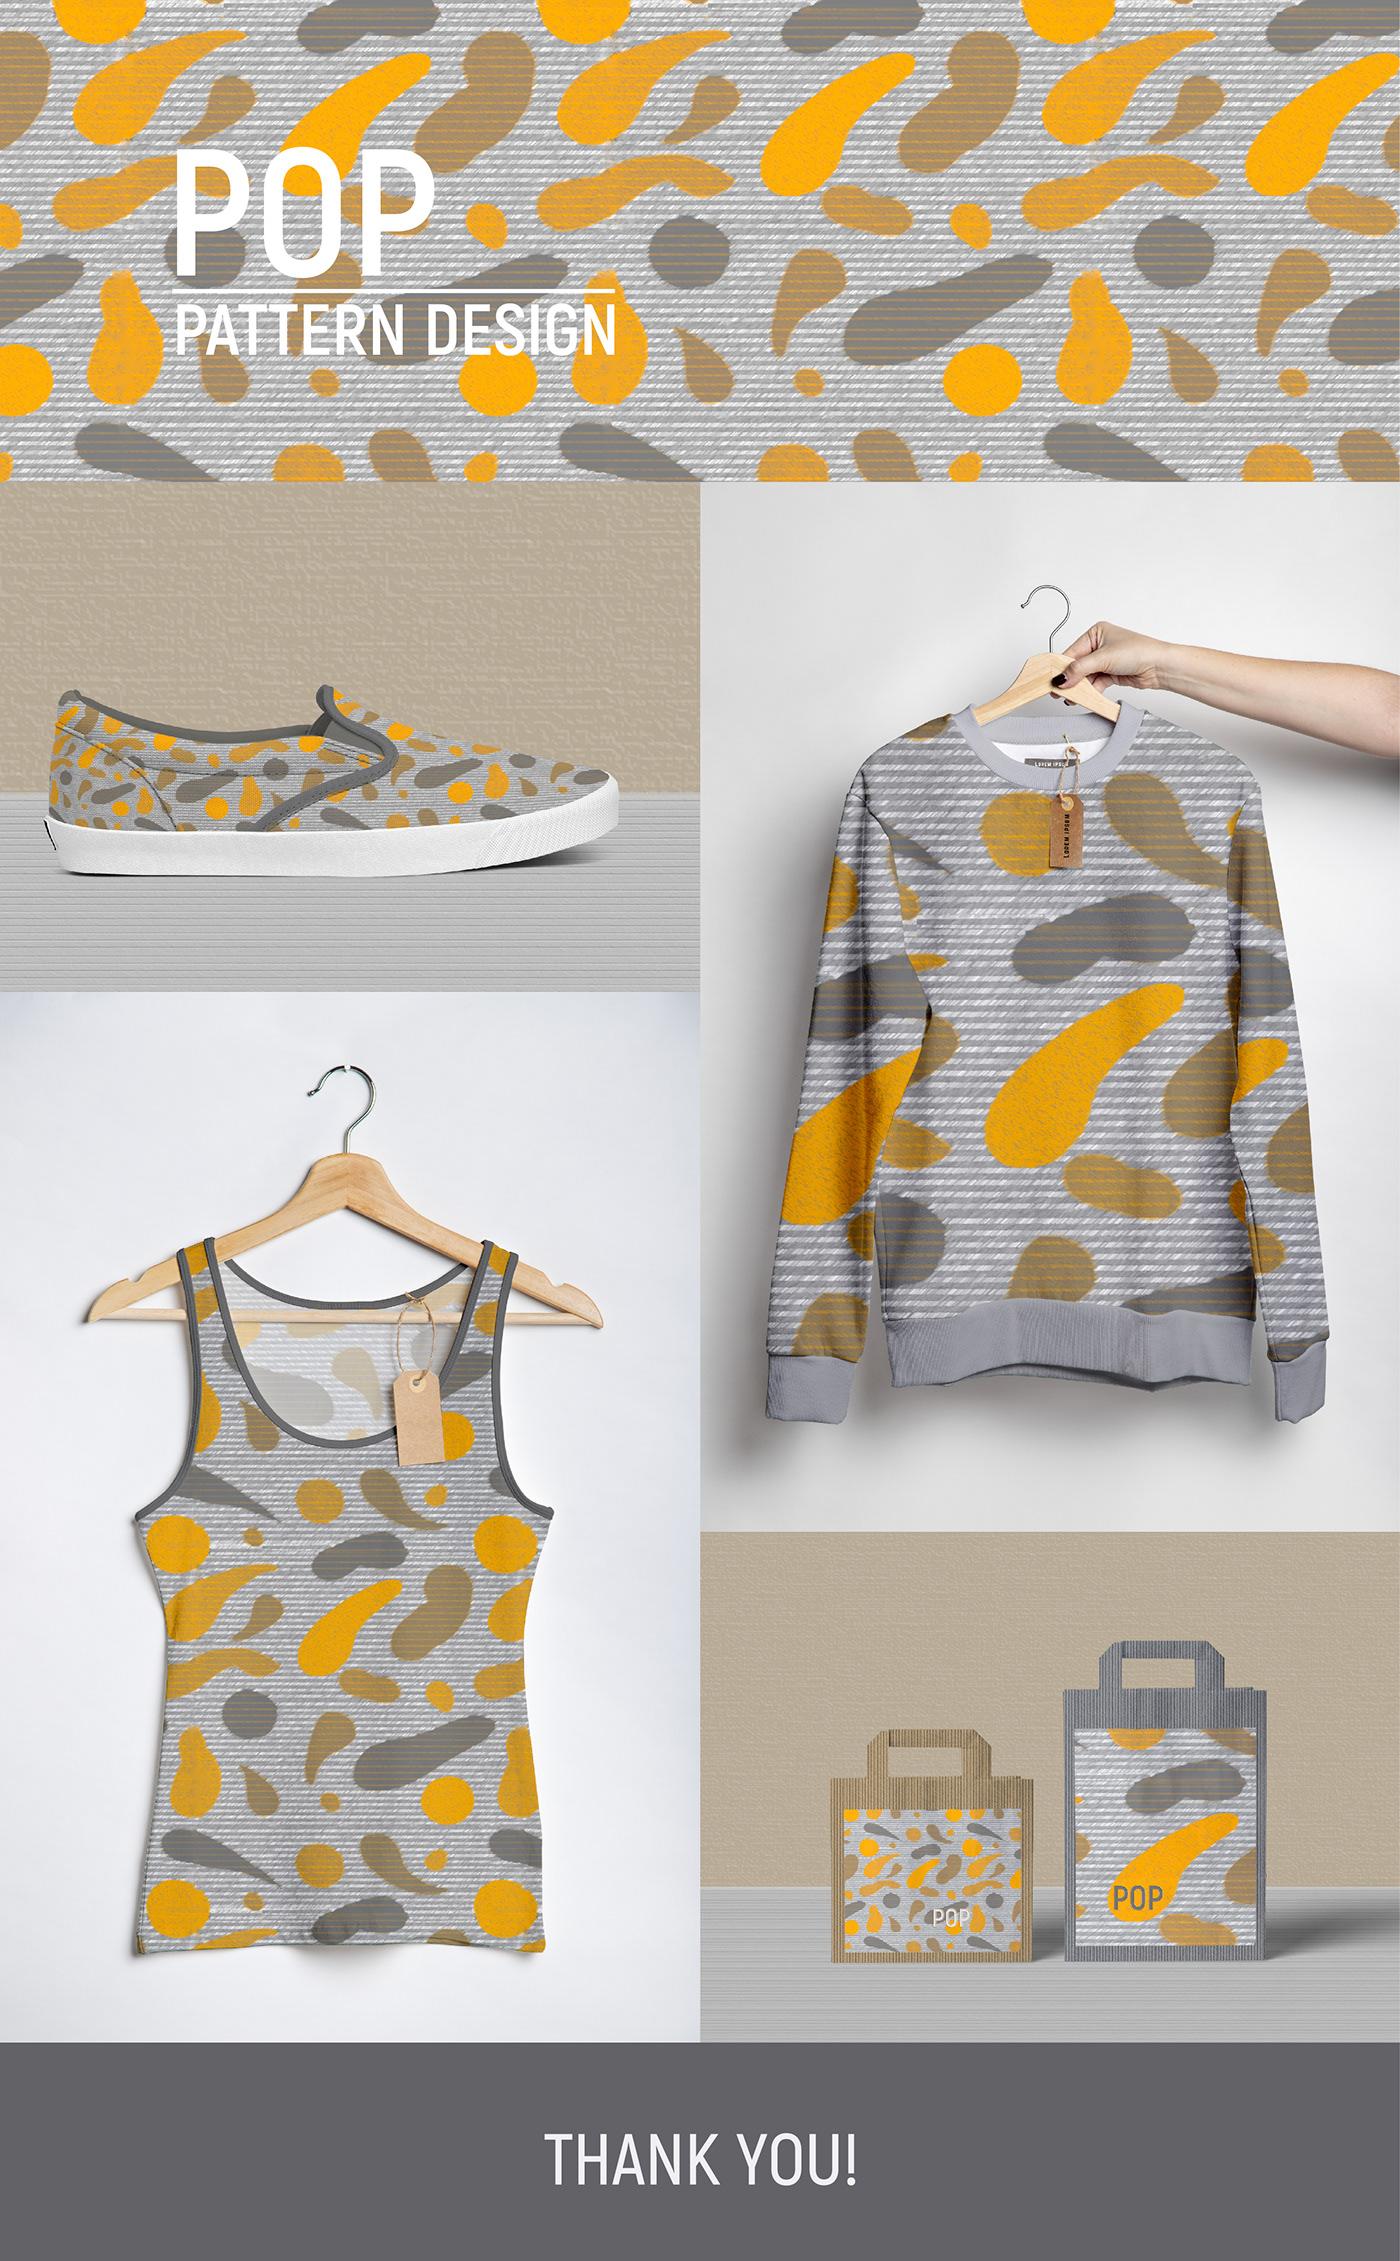 diseñodesuperficies diseñotextil PATTERDESIGN surfacedesign textiledesign